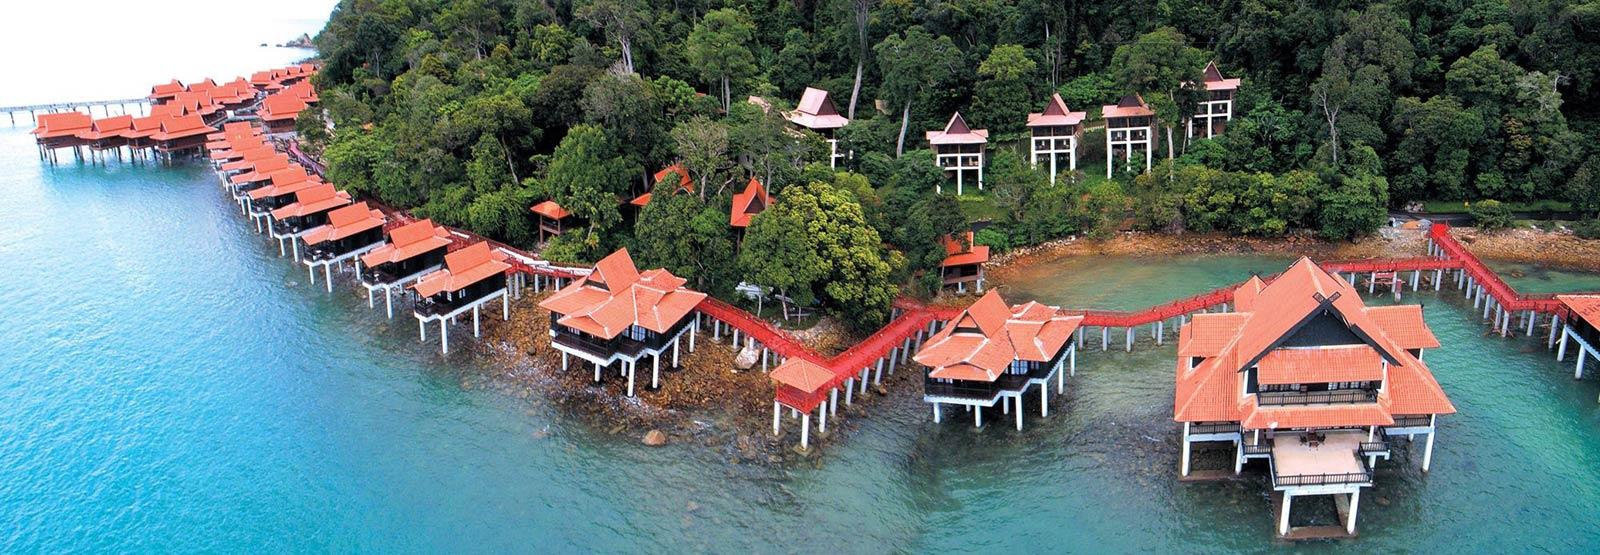 Overwater bungalow in Langkawi